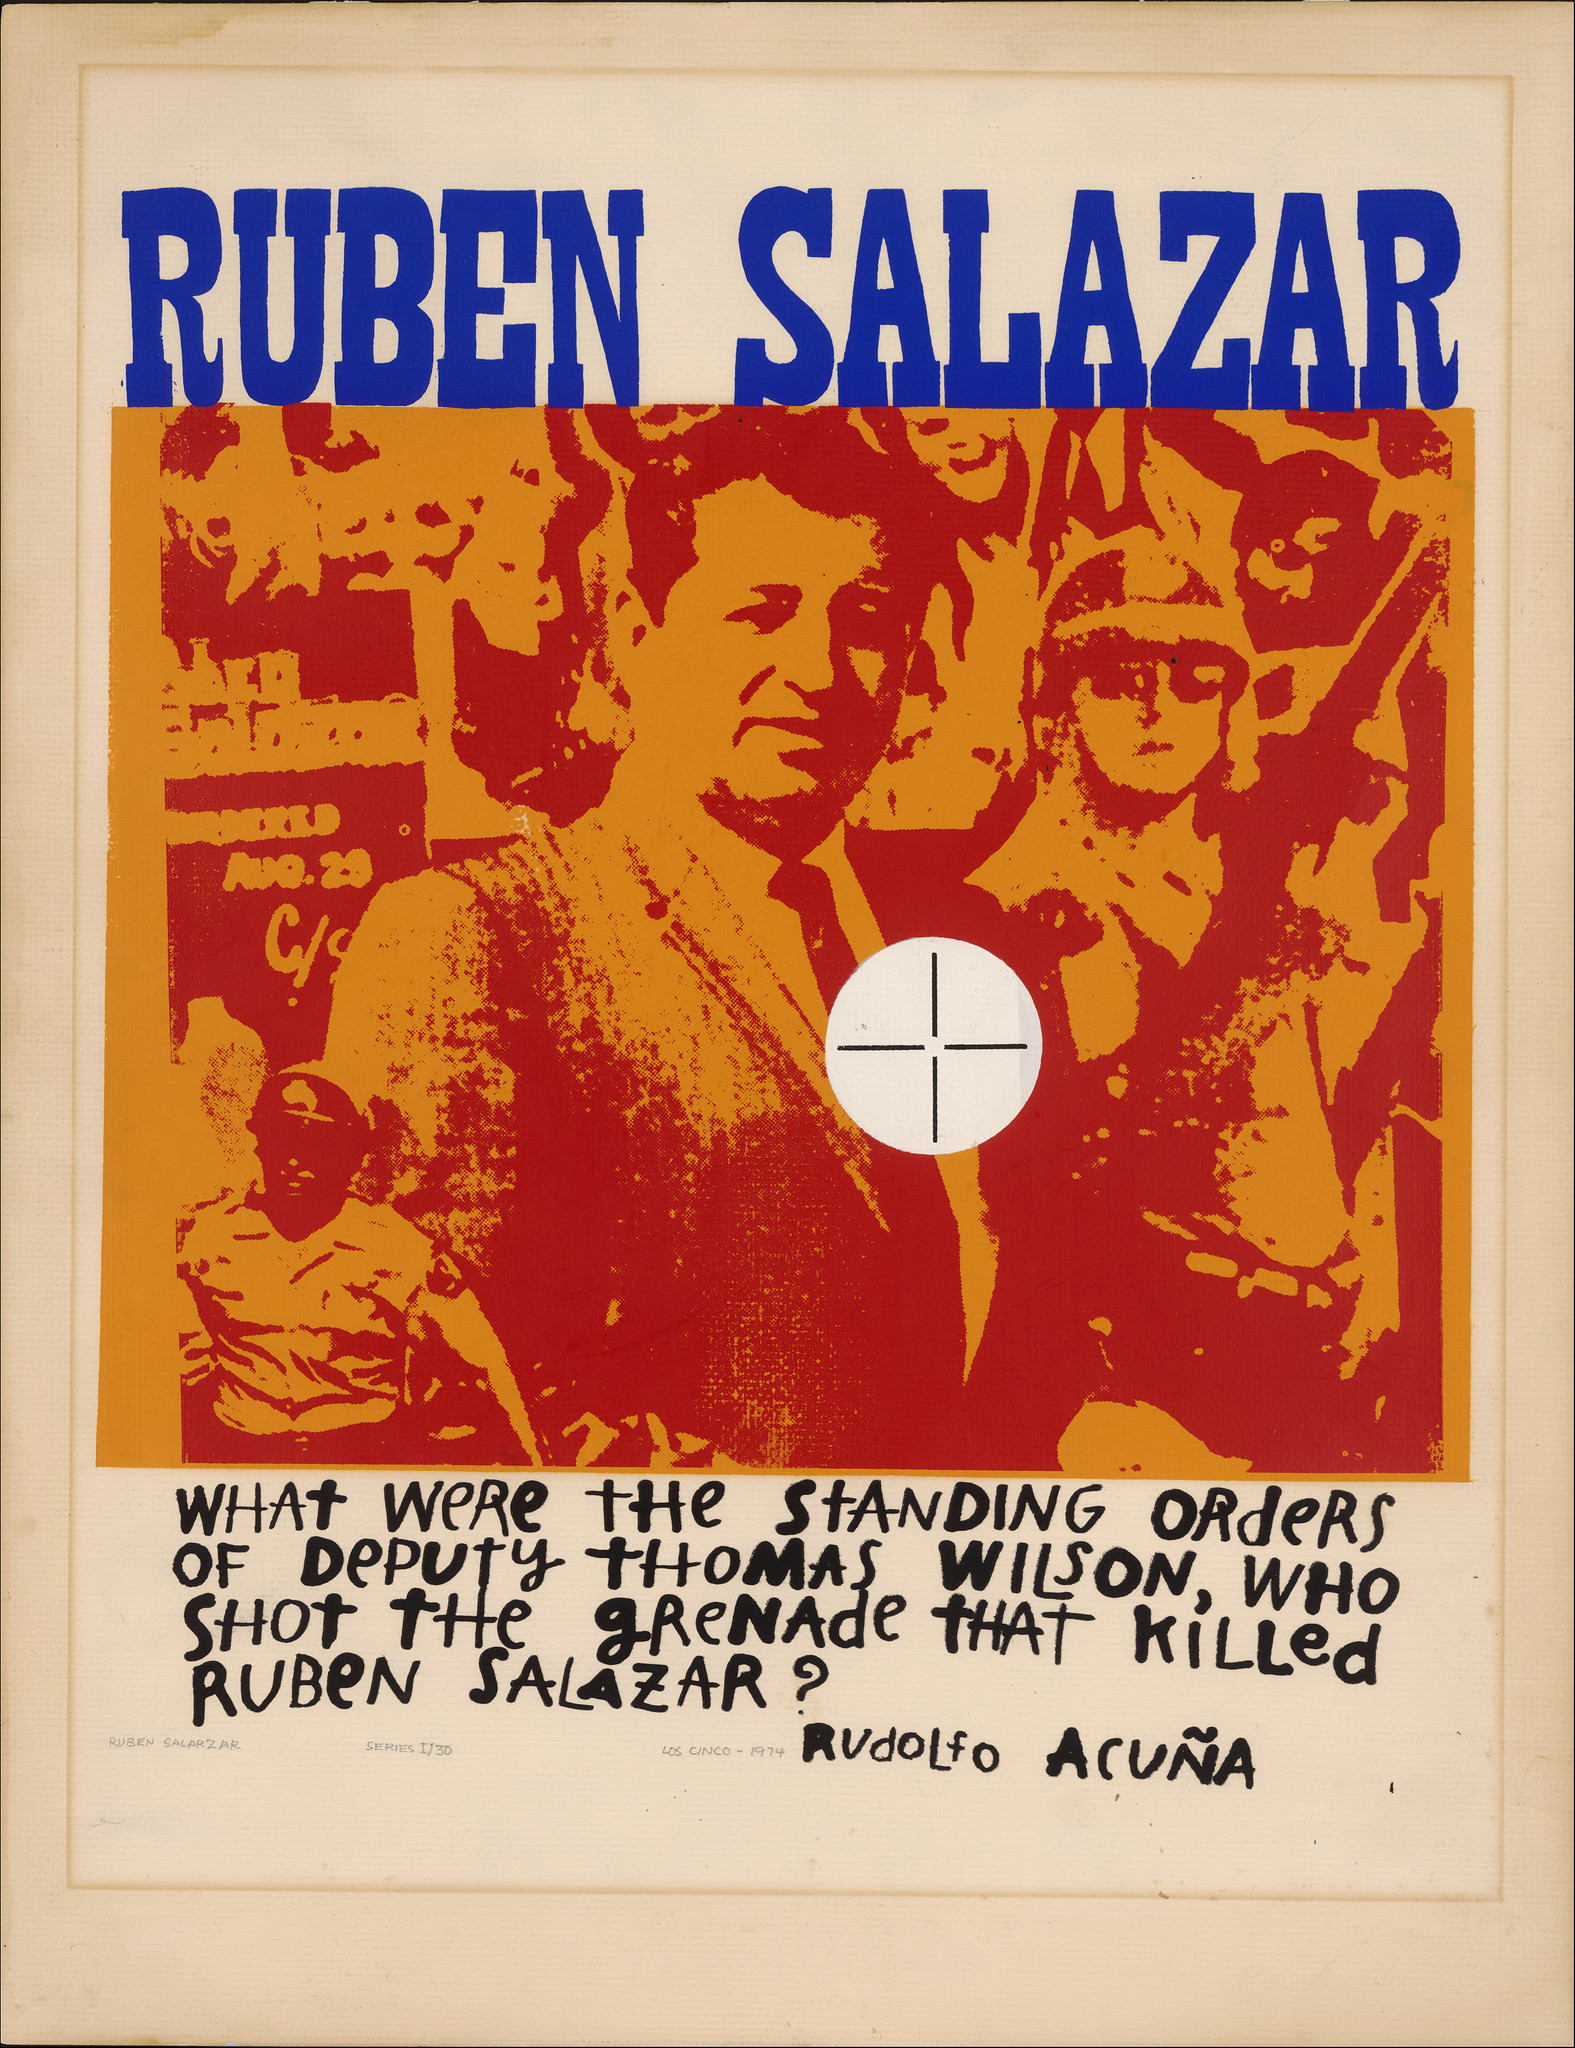 Ruben Salazar by Rudolfo Acuña